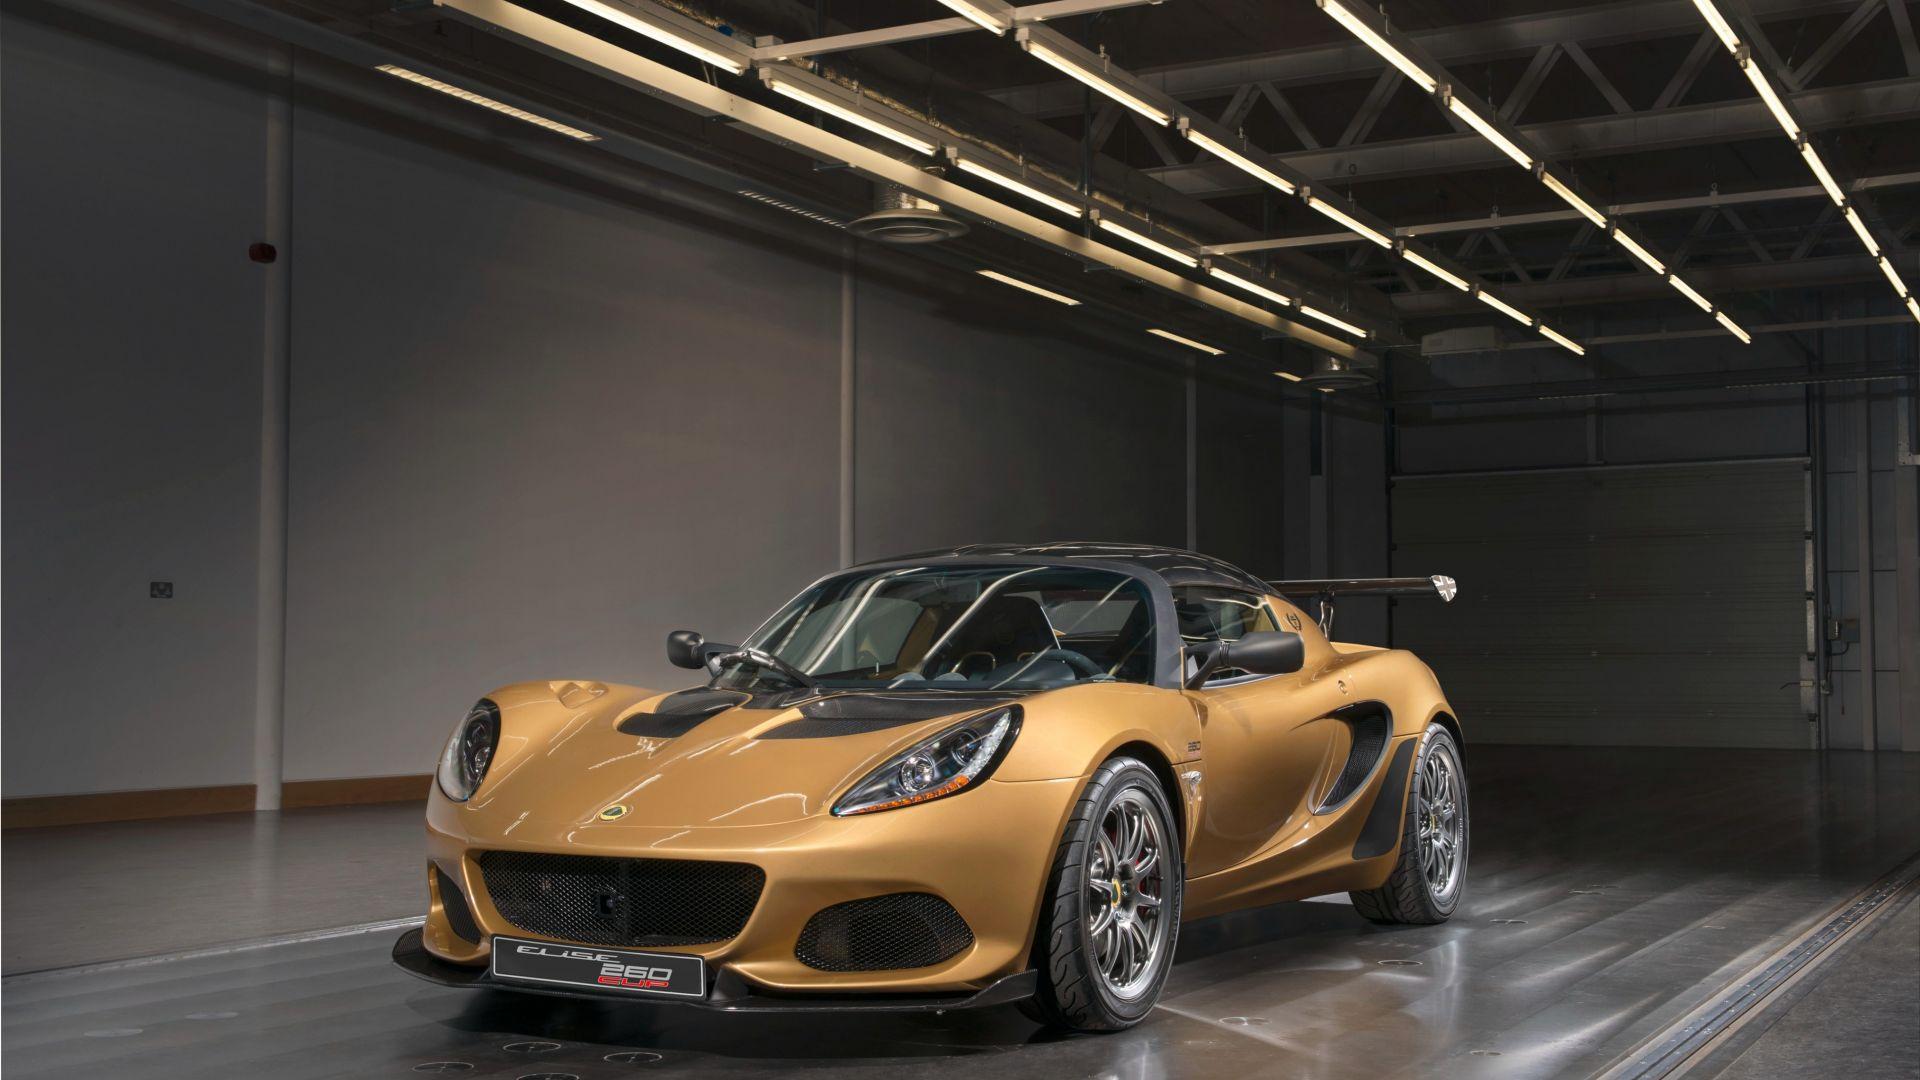 Sports Car, Front, Lotus Elise Wallpaper Nice Look